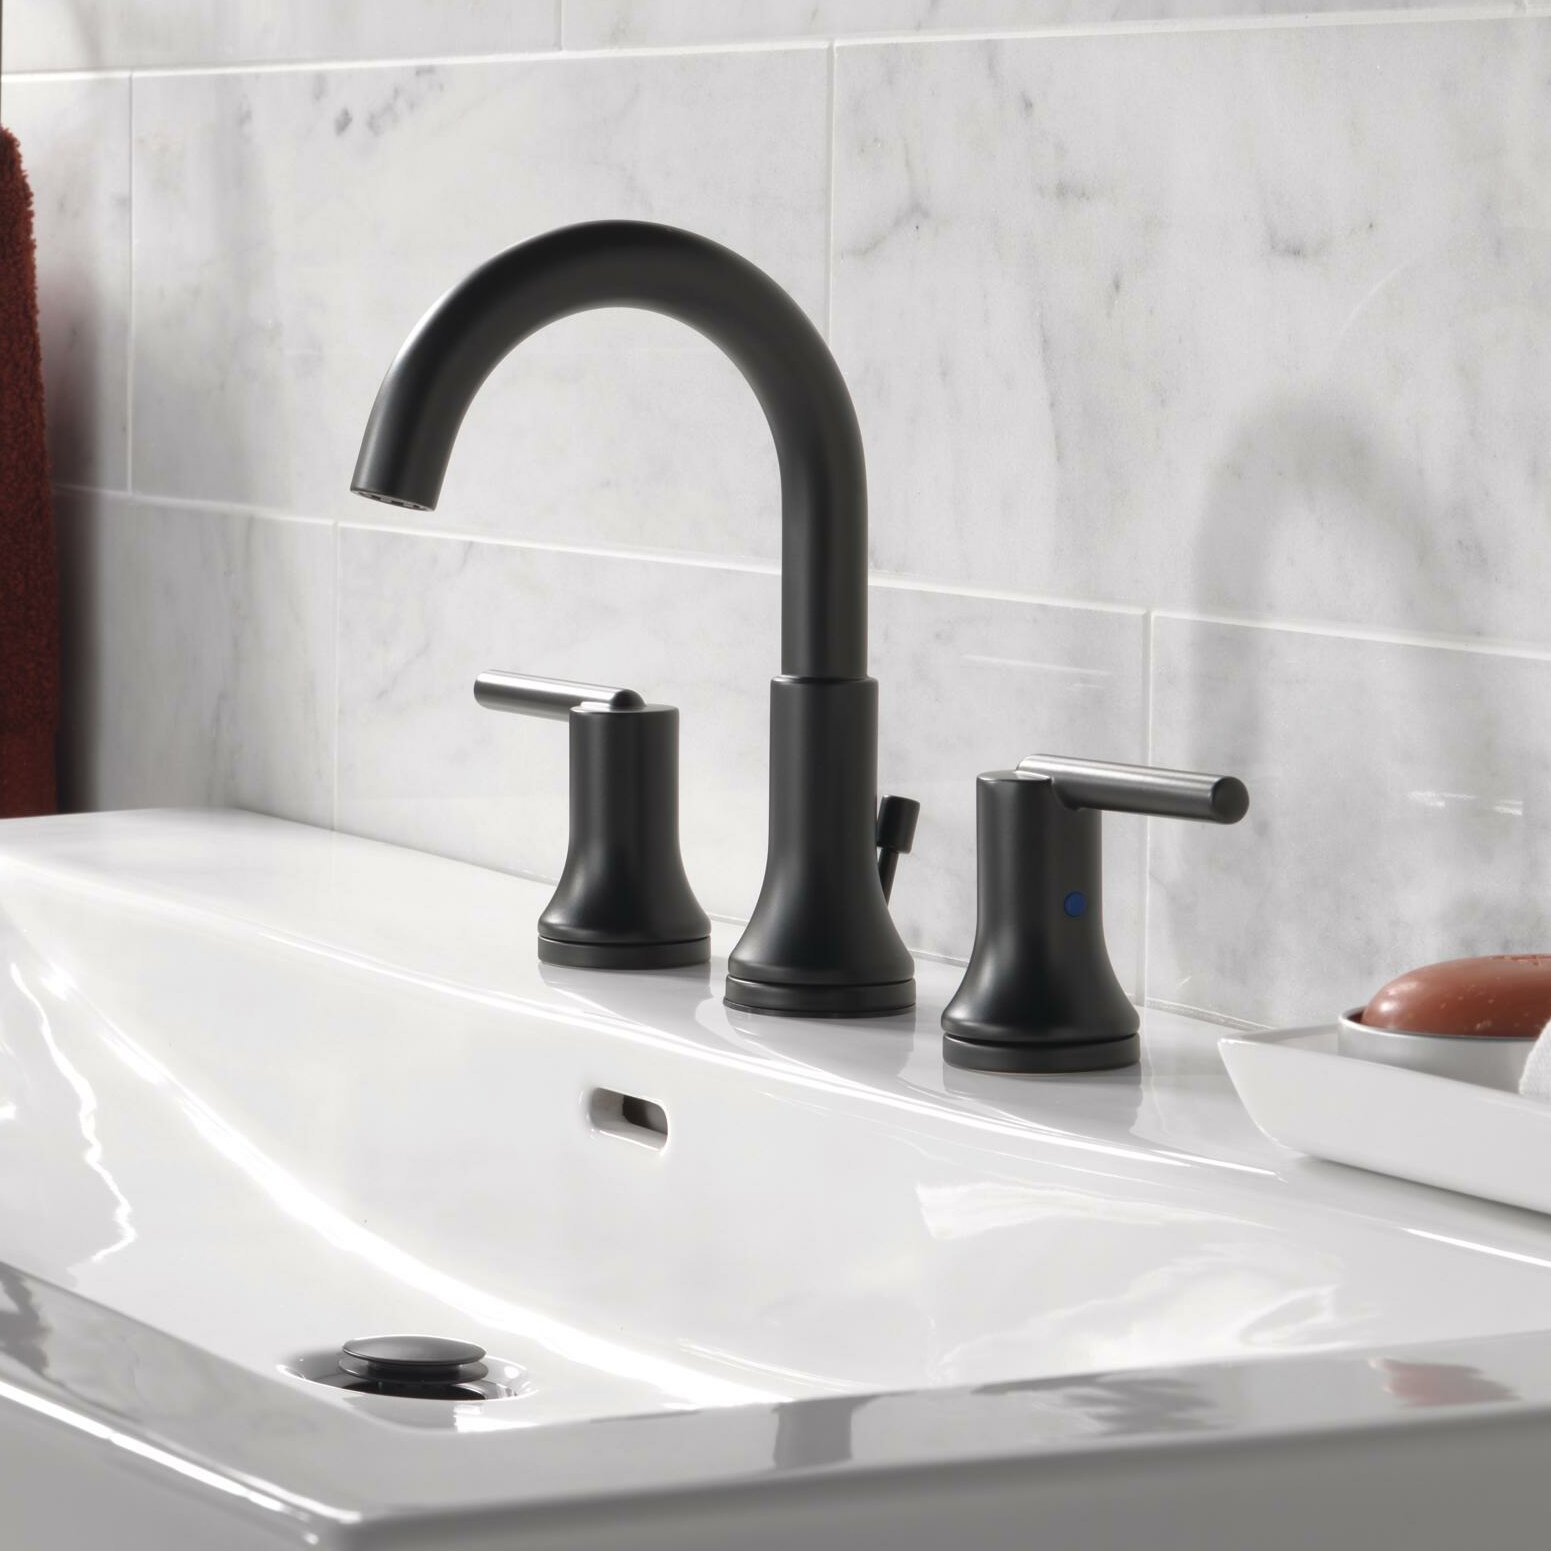 Black Bathroom Sink Faucets You Ll Love Wayfair Ca